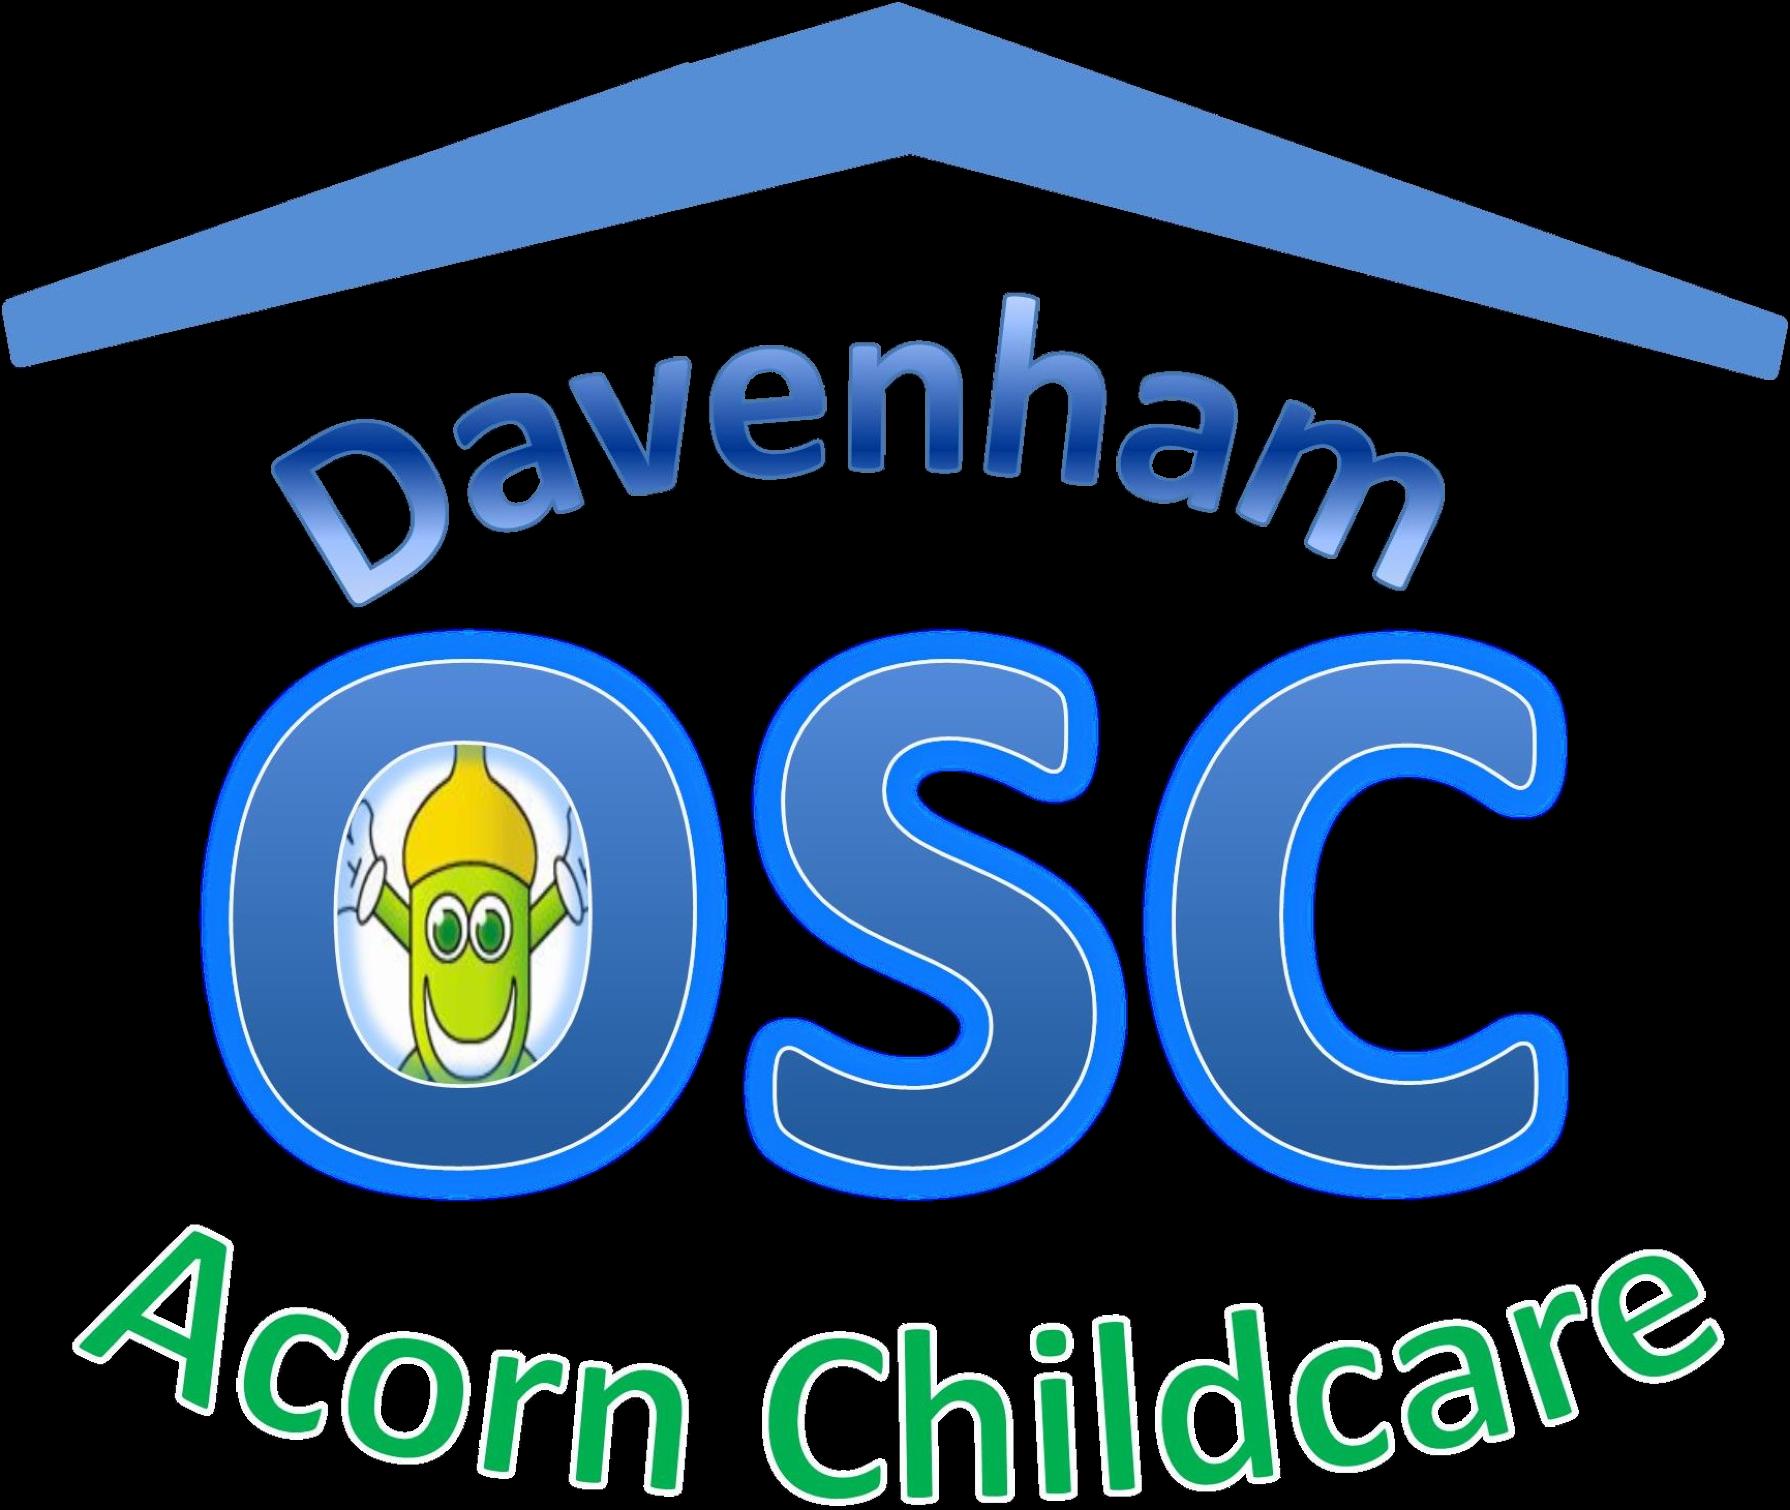 Davenham Out of School Club